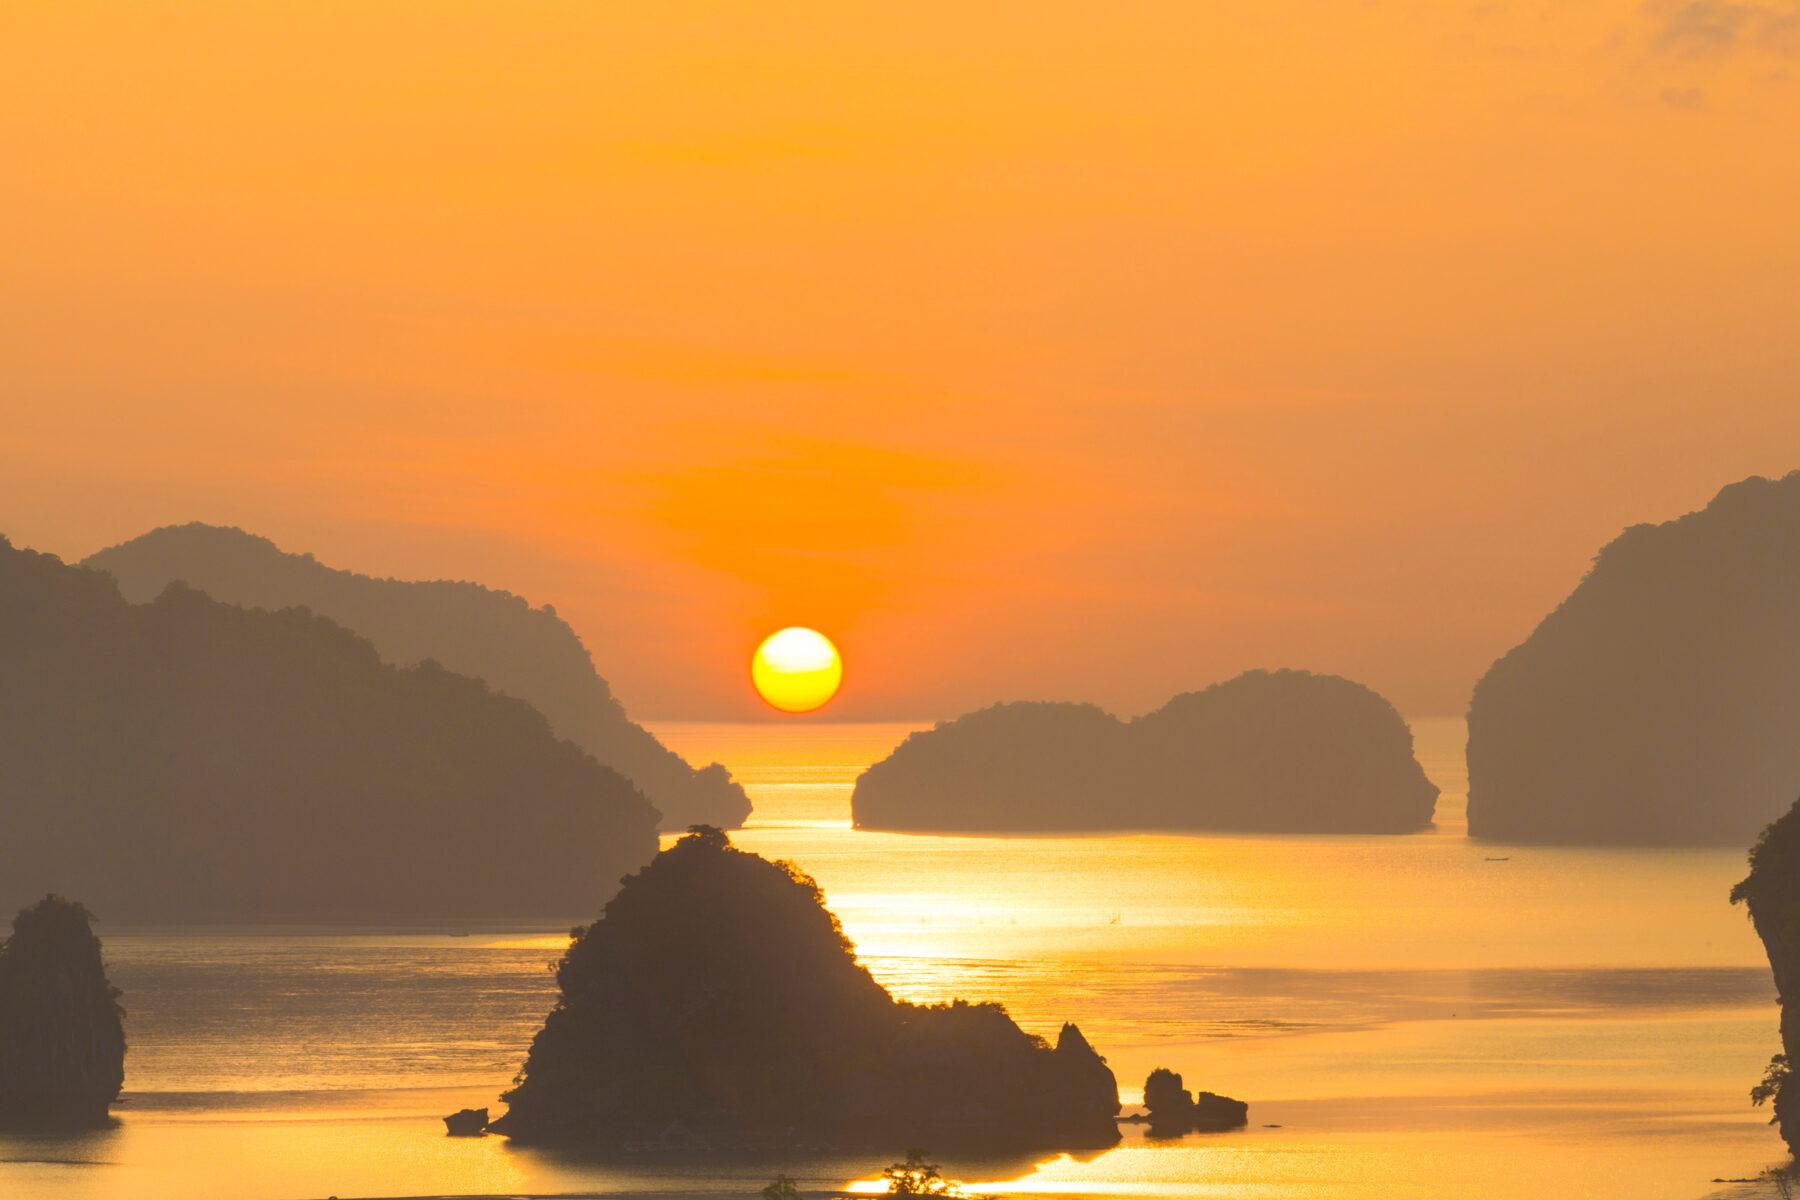 View of Thailand's Andaman Sea from the Sarasin Bridge